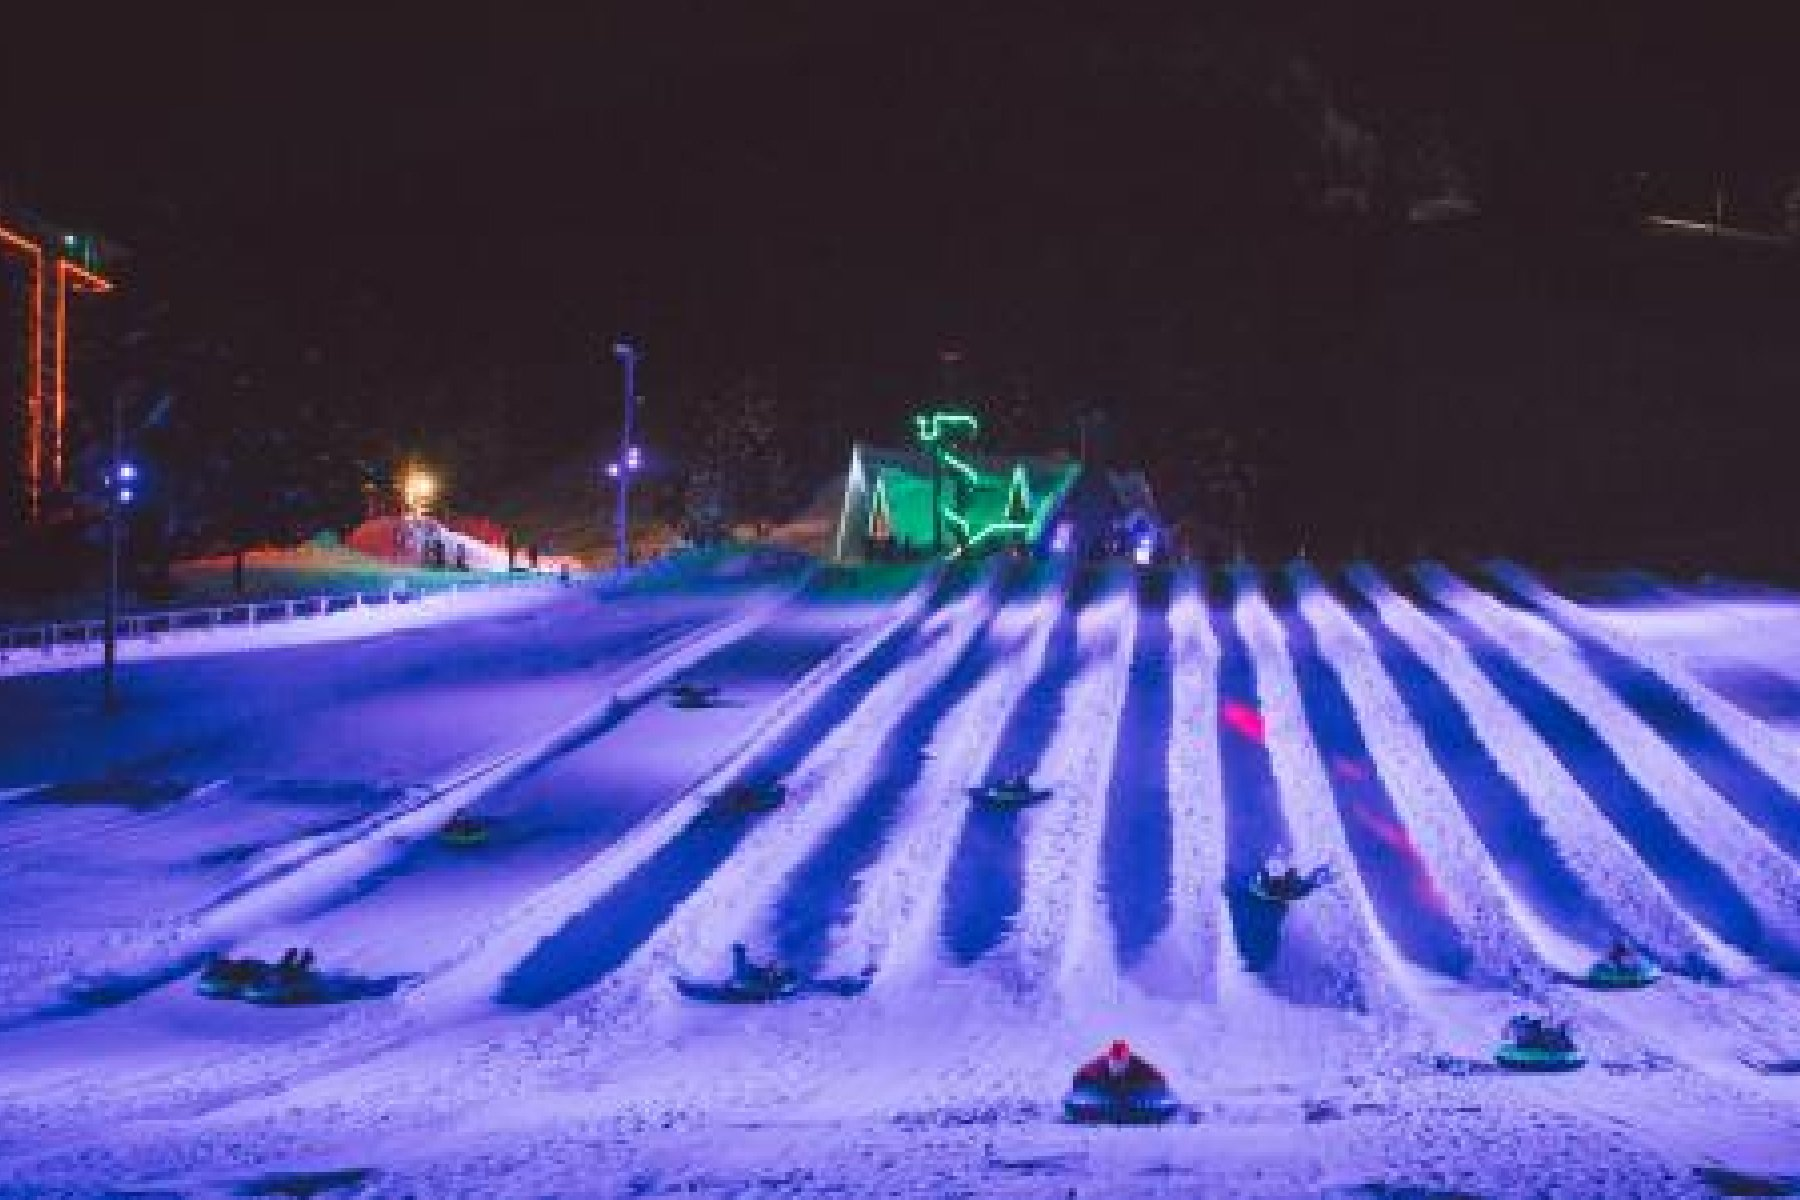 Mt Hood Skibowl Cosmic Tubing Oregon Skiing Snow